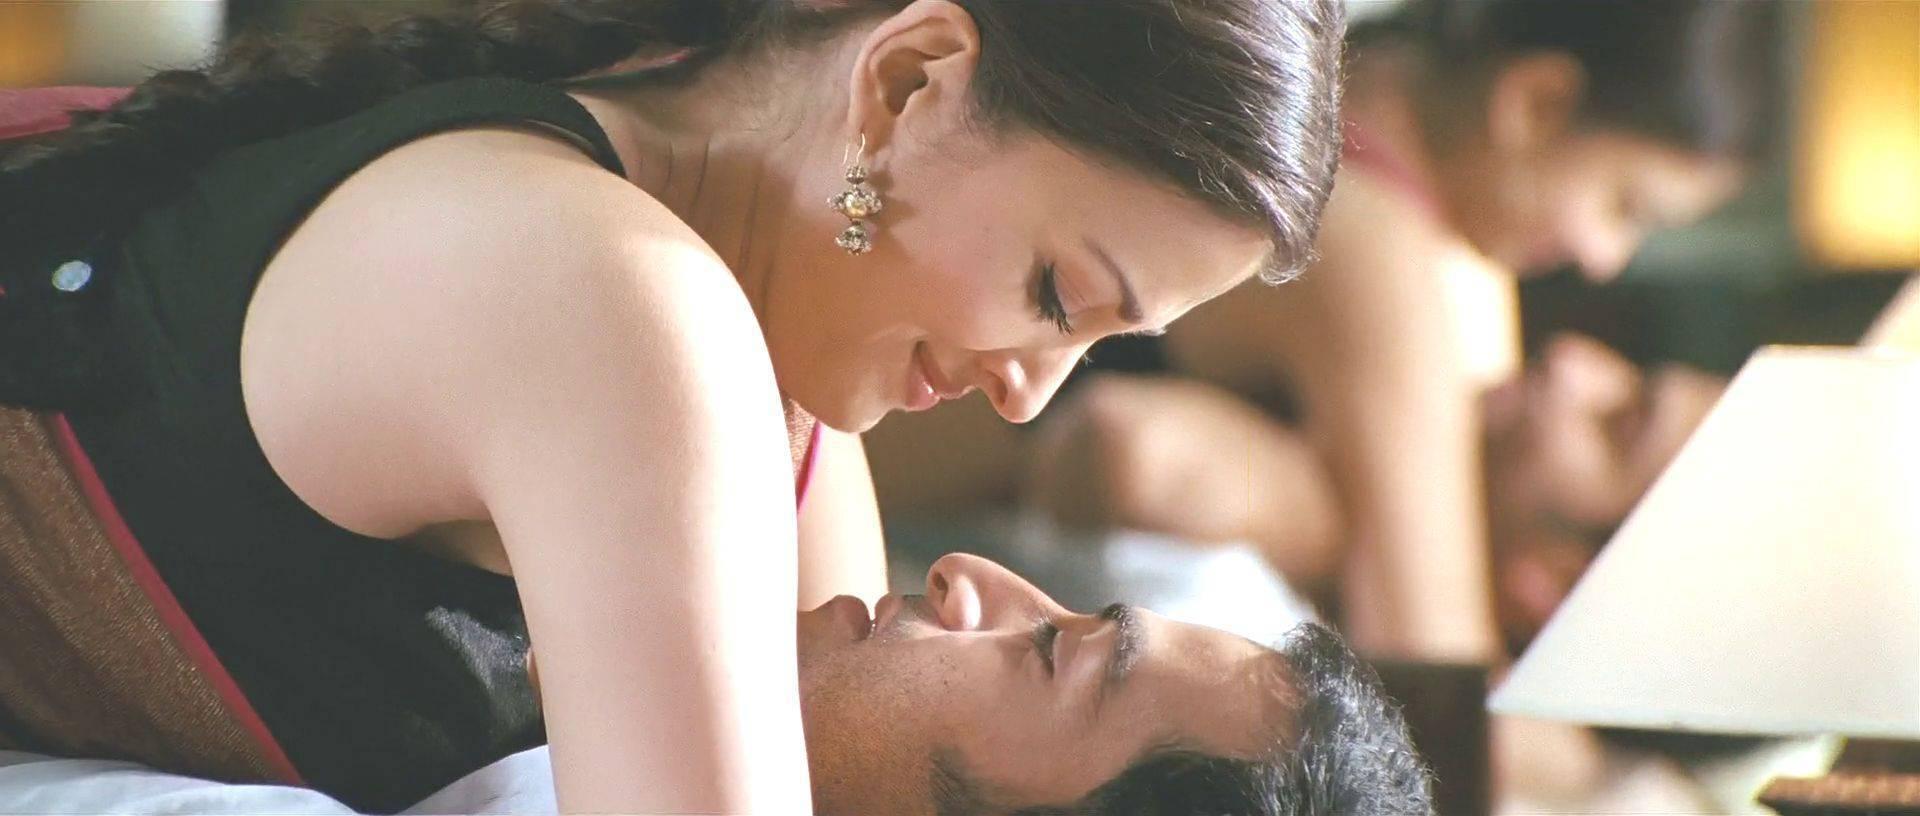 11 лучших порно видео с Priya Anjali Rai.